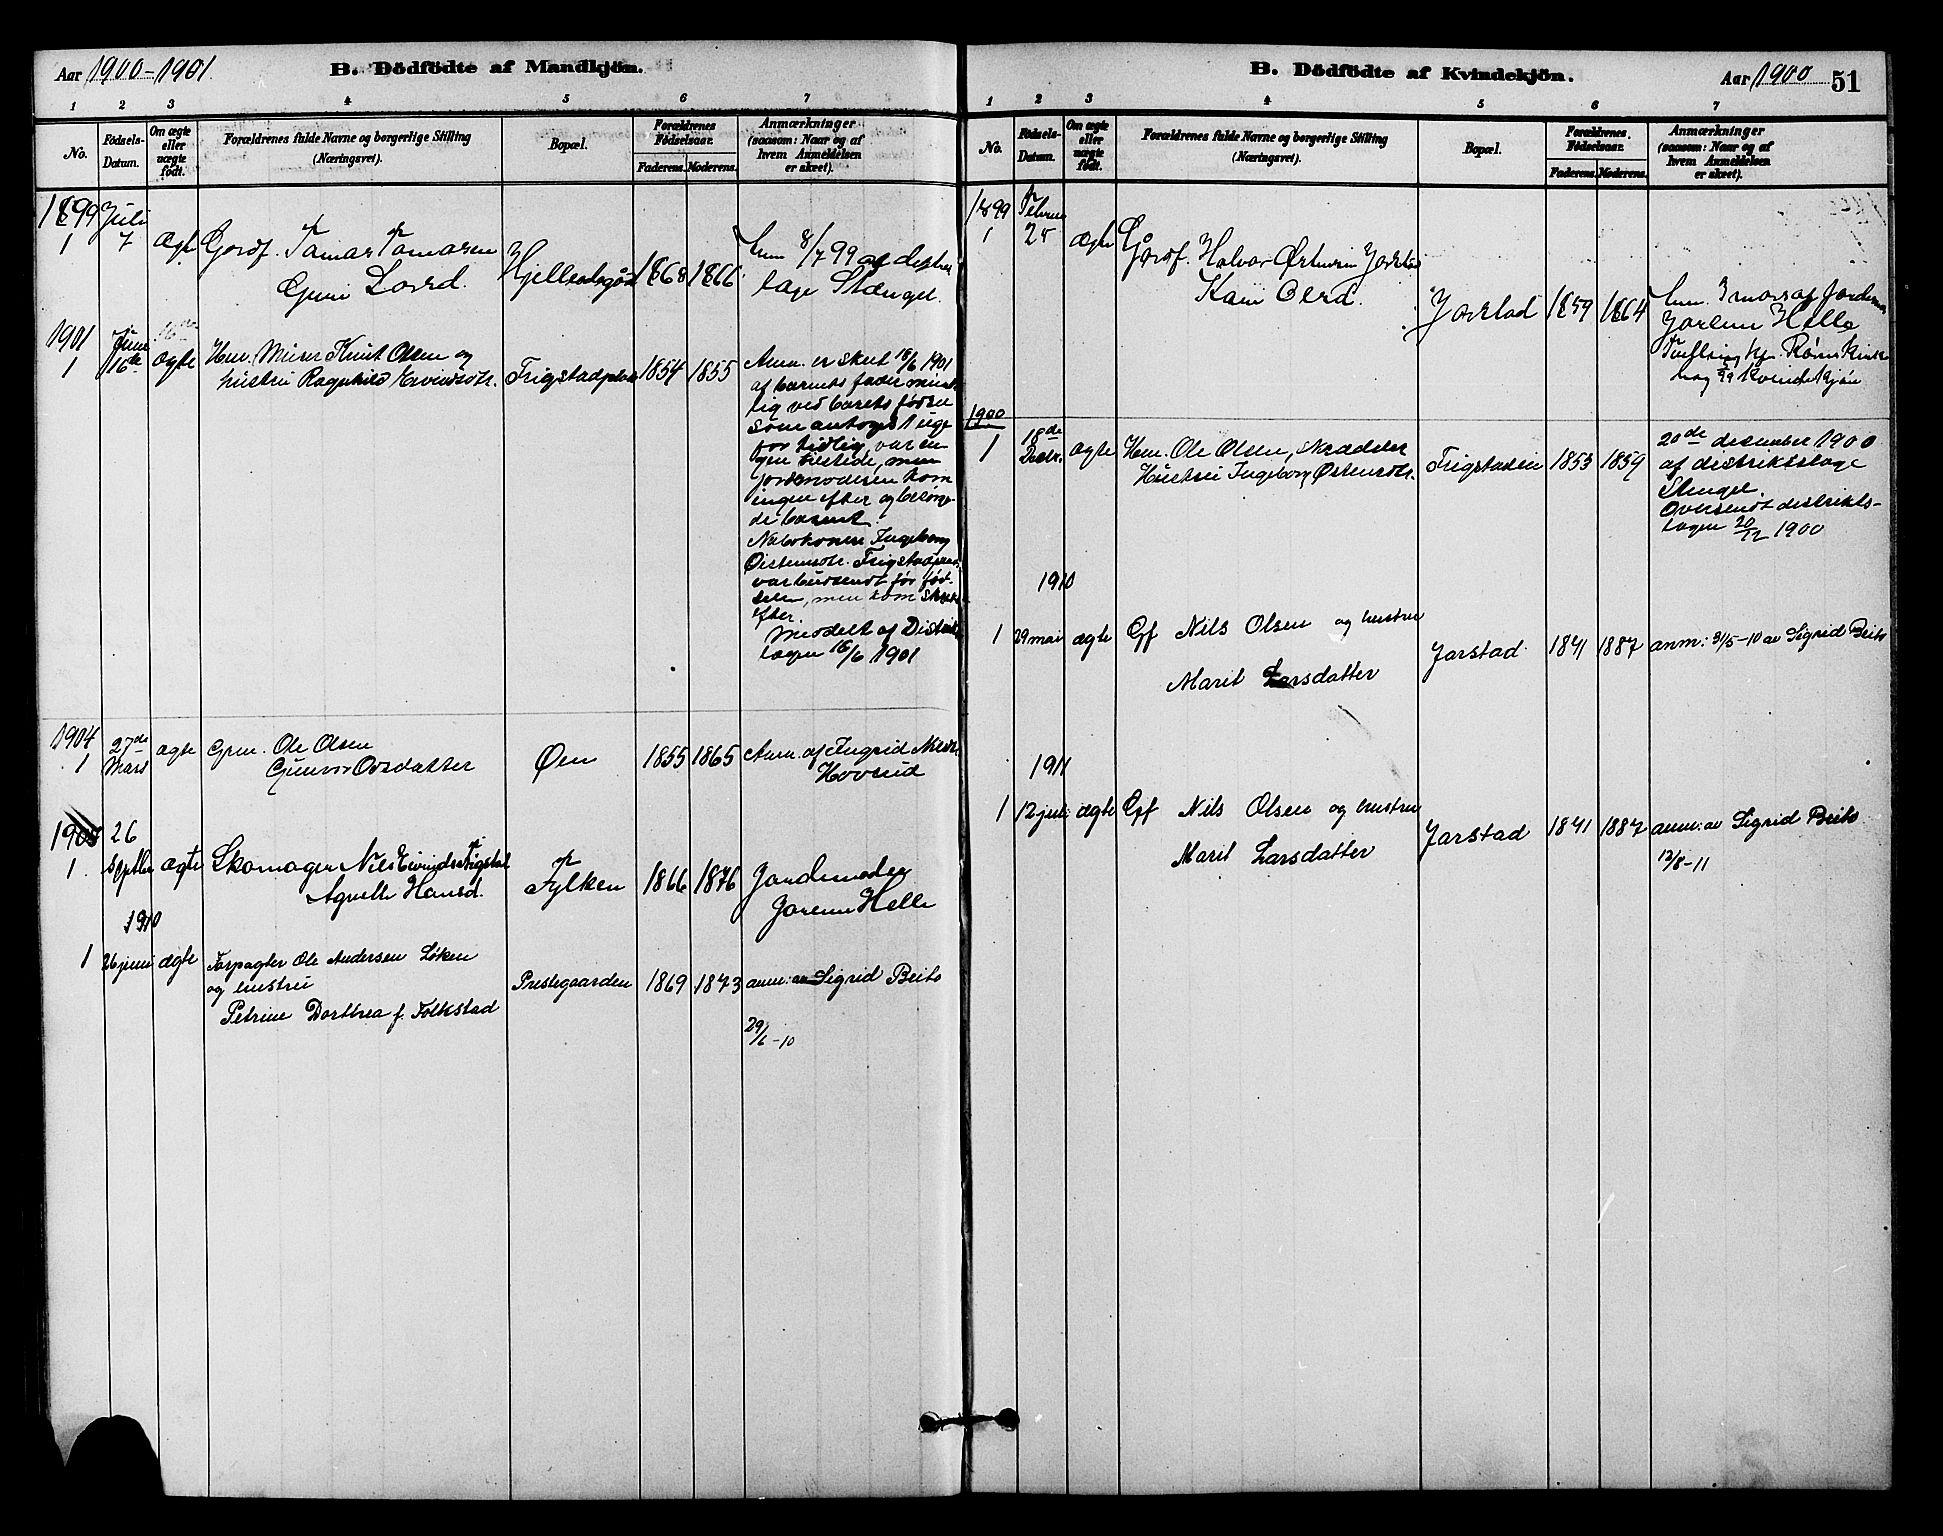 SAH, Vestre Slidre prestekontor, Klokkerbok nr. 4, 1881-1912, s. 51